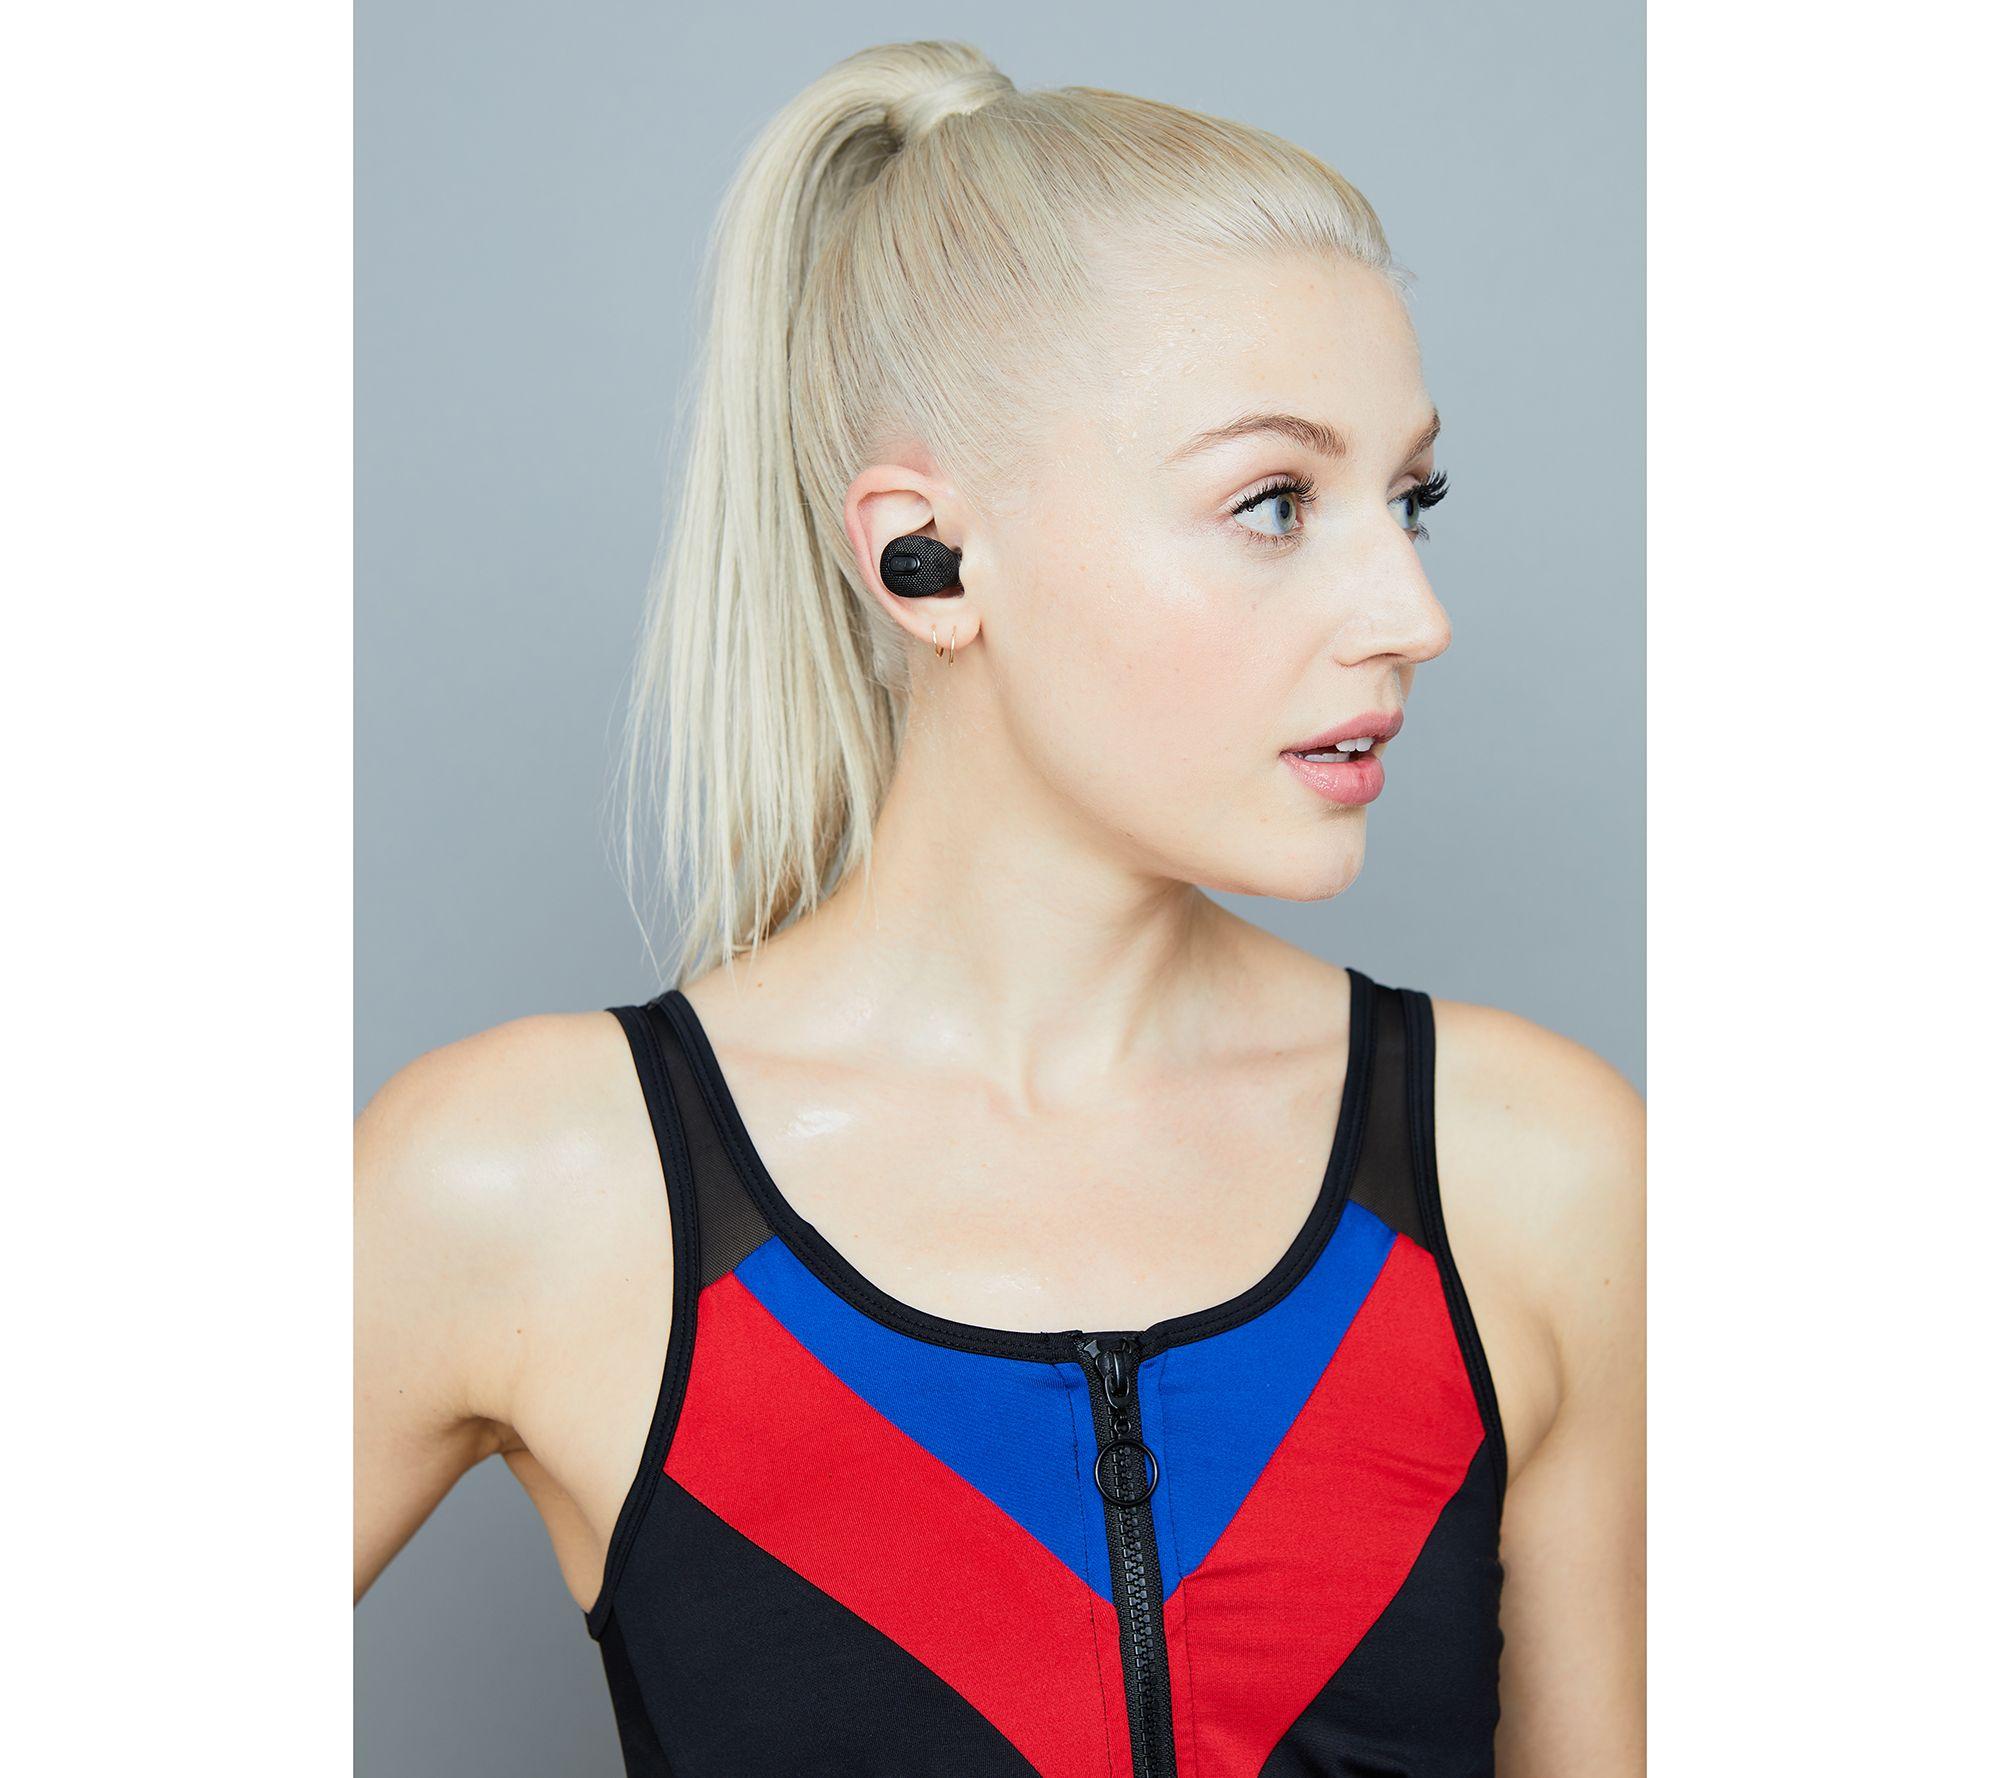 7390e8ef6d1 JAM Live True Wireless In-Ear Headphones - Page 1 — QVC.com